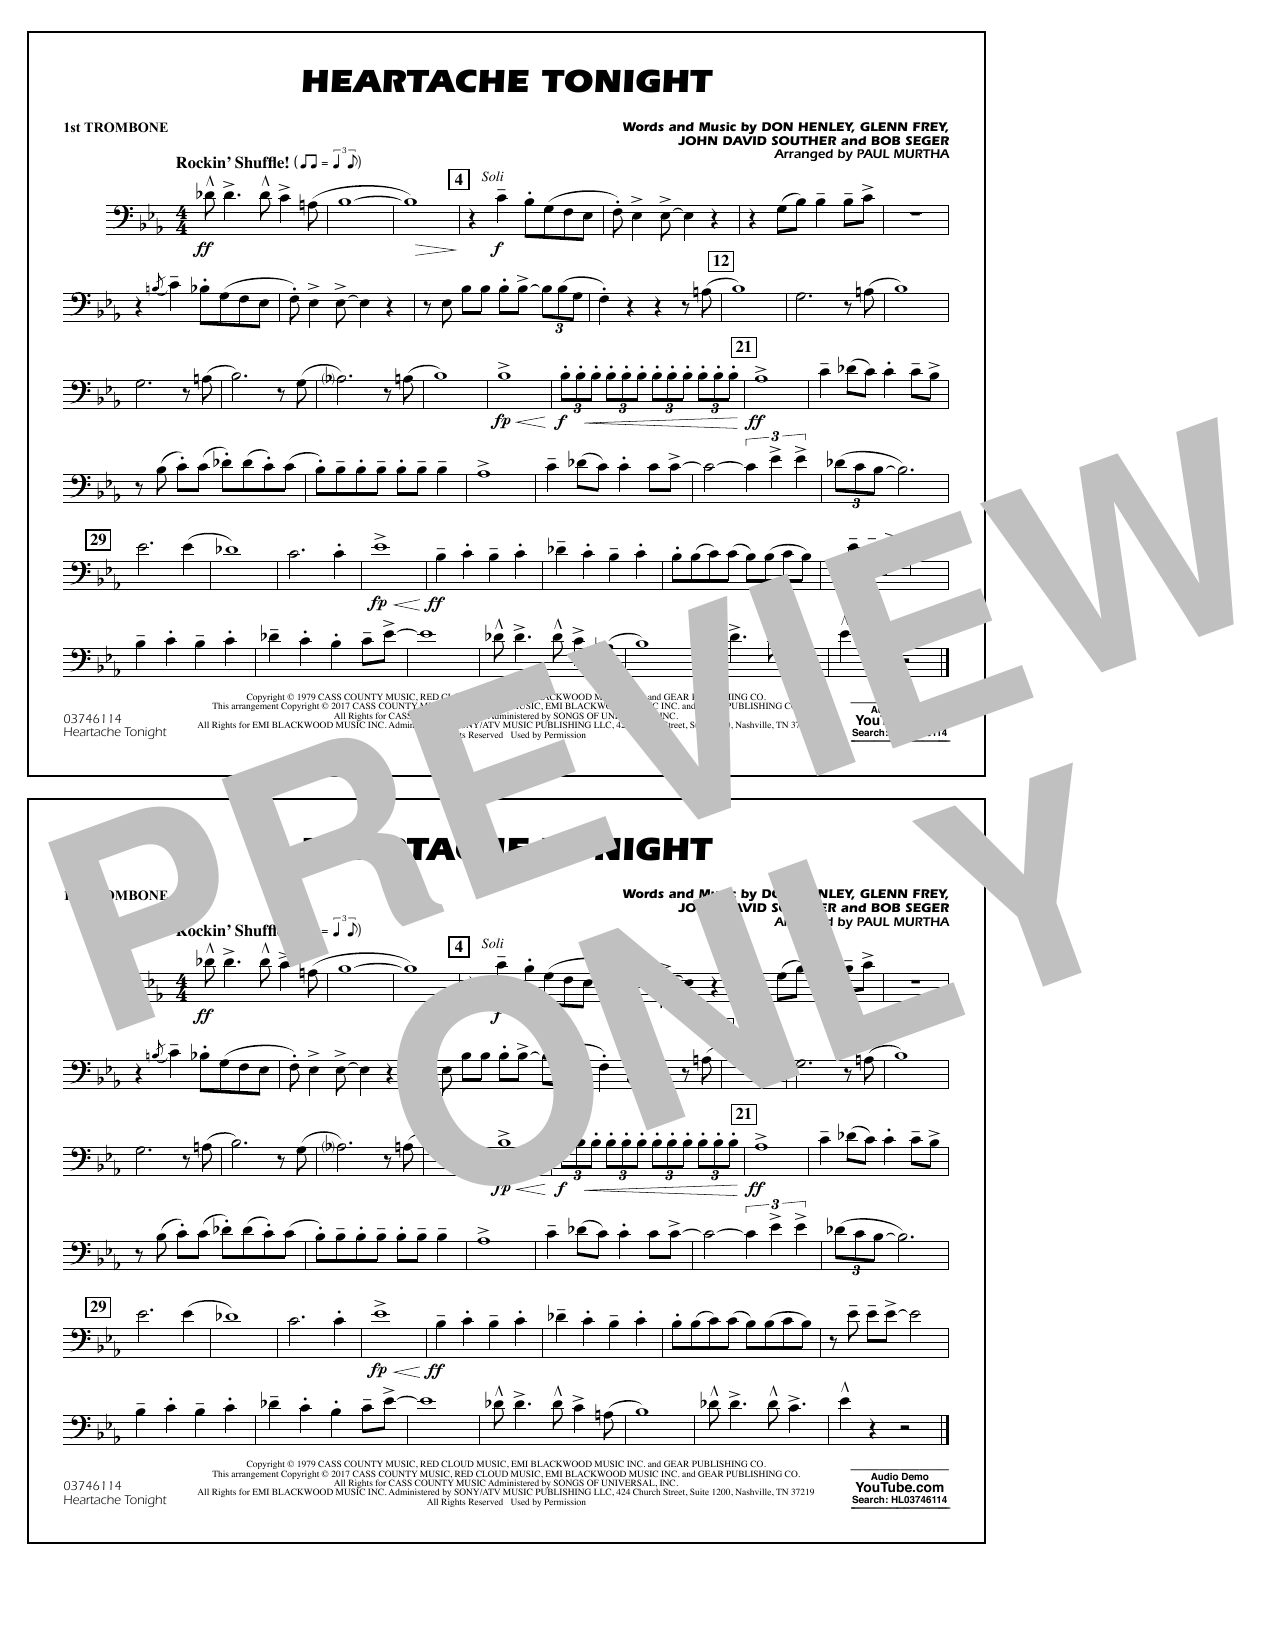 Heartache Tonight - 1st Trombone Sheet Music